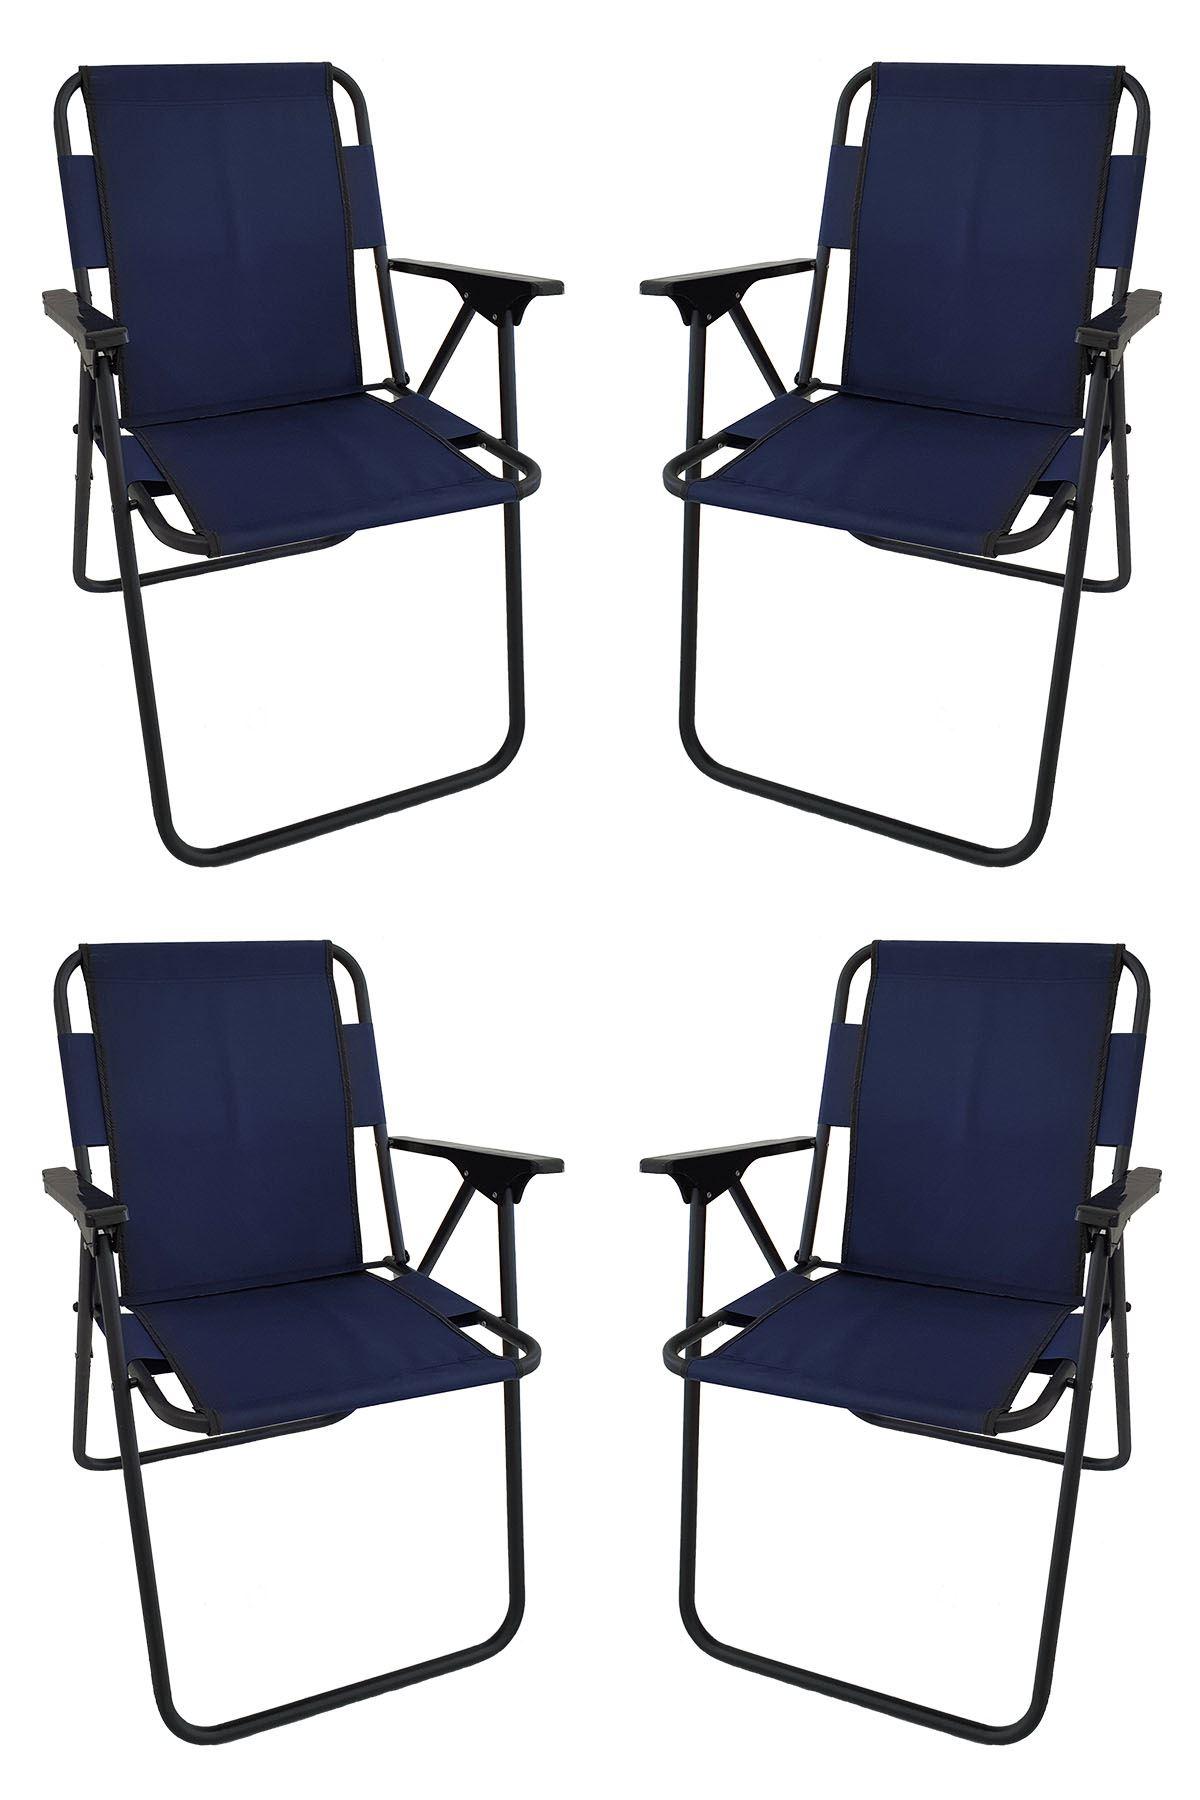 Bofigo 60X80 Granite Patterned Folding Table + 4 Pieces Folding Chair Camping Set Garden Set Navy BlueBofigo 60X80 Granite Patterned Folding Table + 4 Pieces Folding Chair Camping Set Garden Set Navy Blue